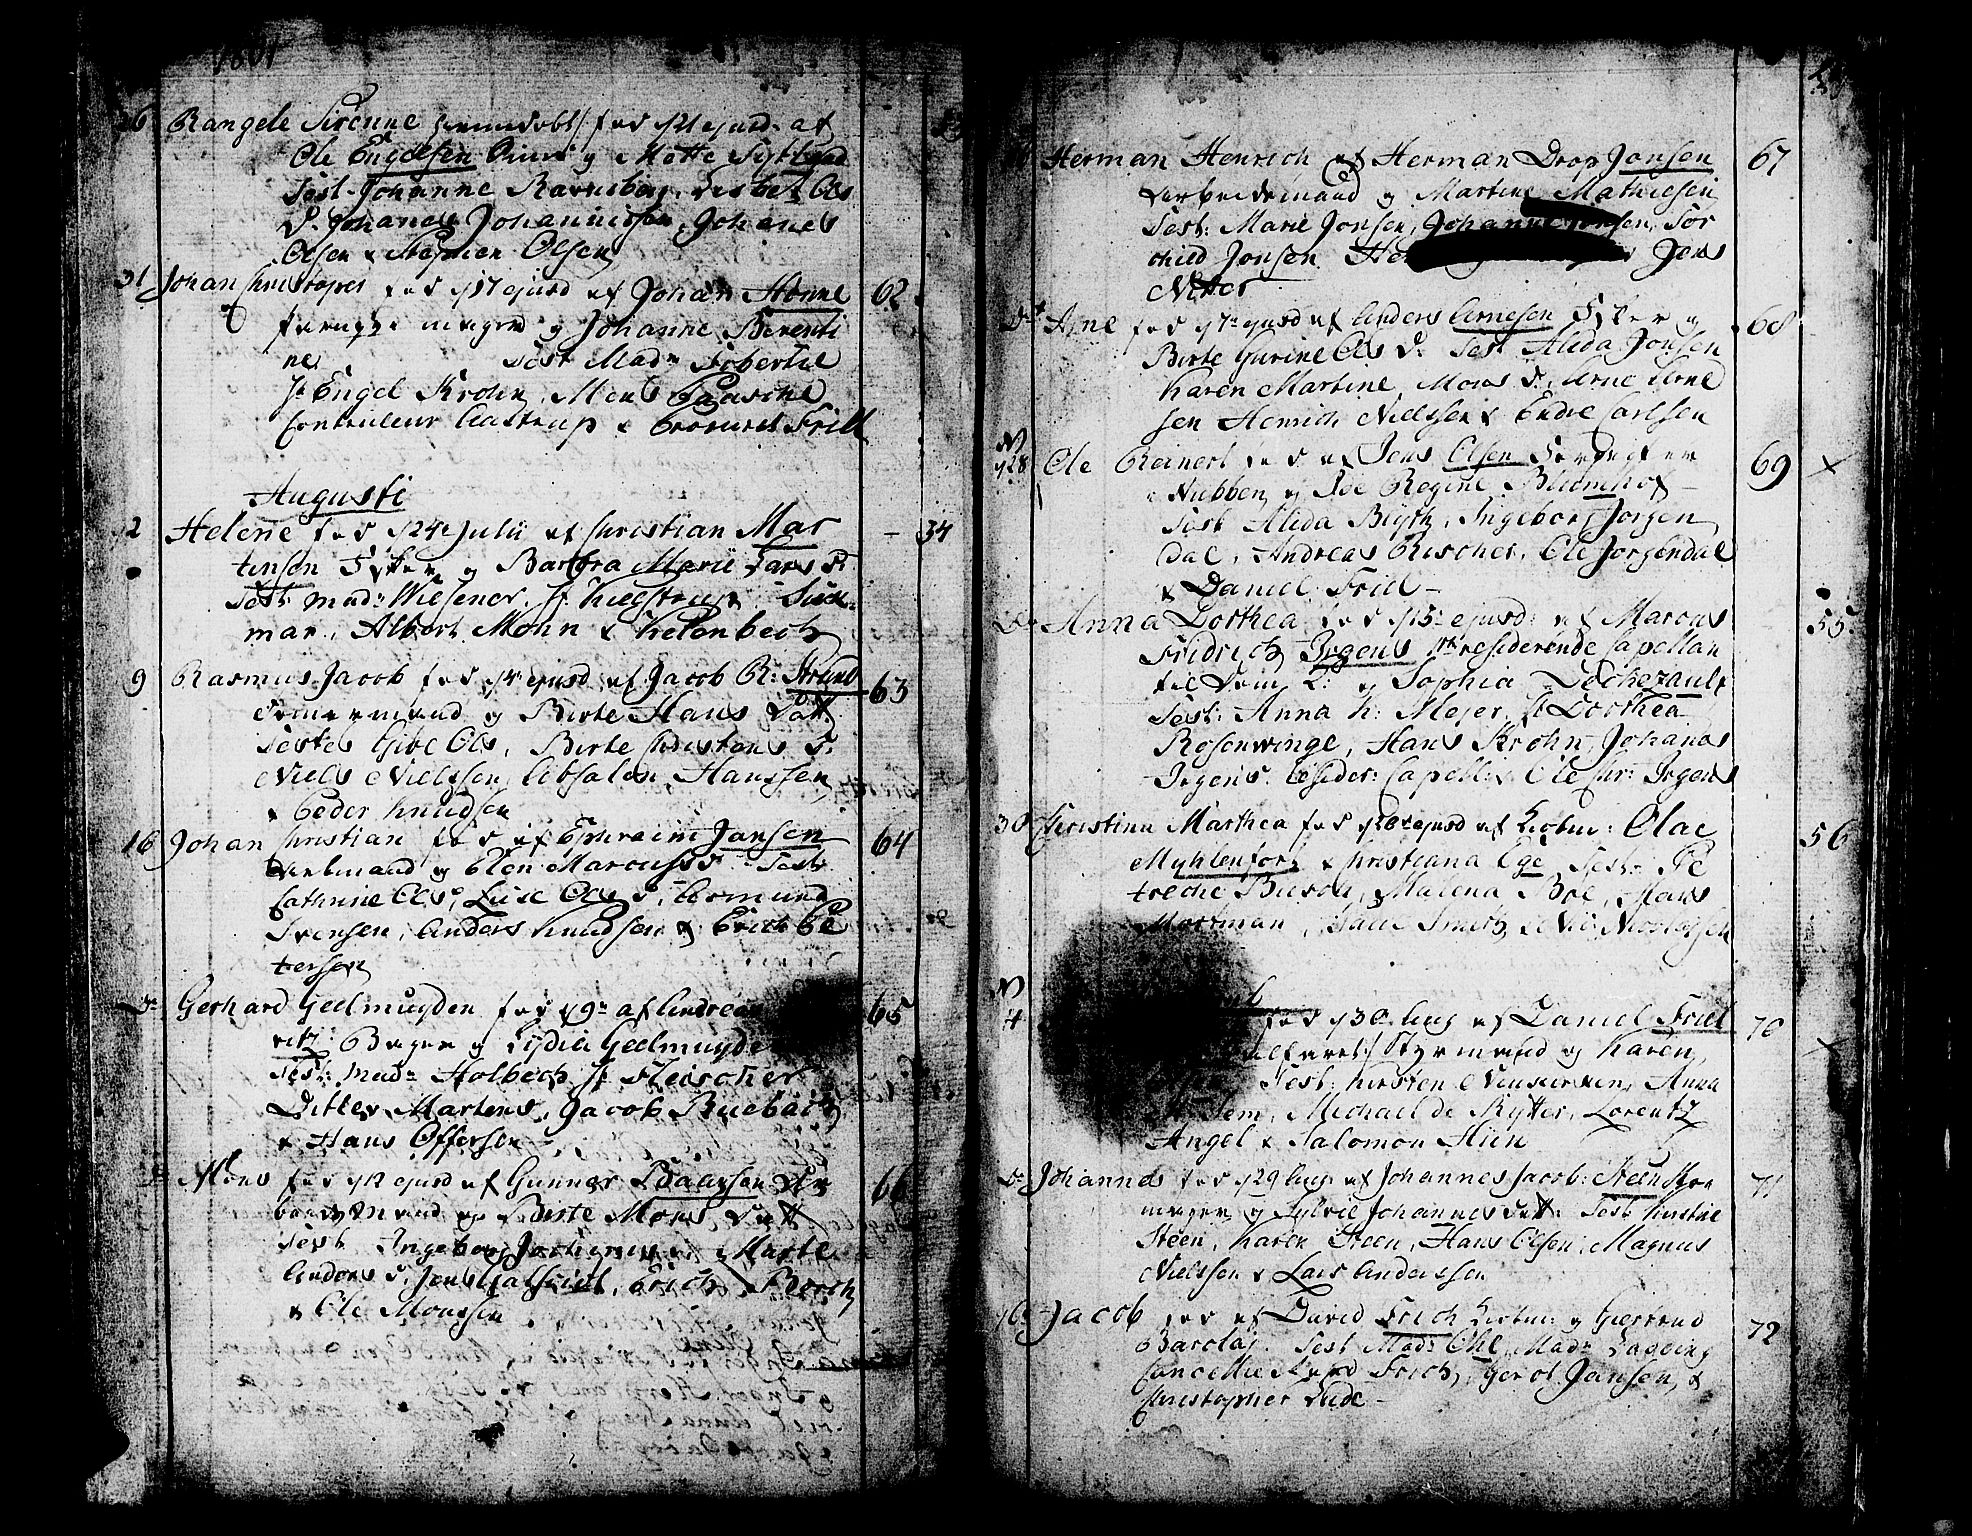 SAB, Domkirken sokneprestembete, H/Haa/L0004: Ministerialbok nr. A 4, 1763-1820, s. 258-259